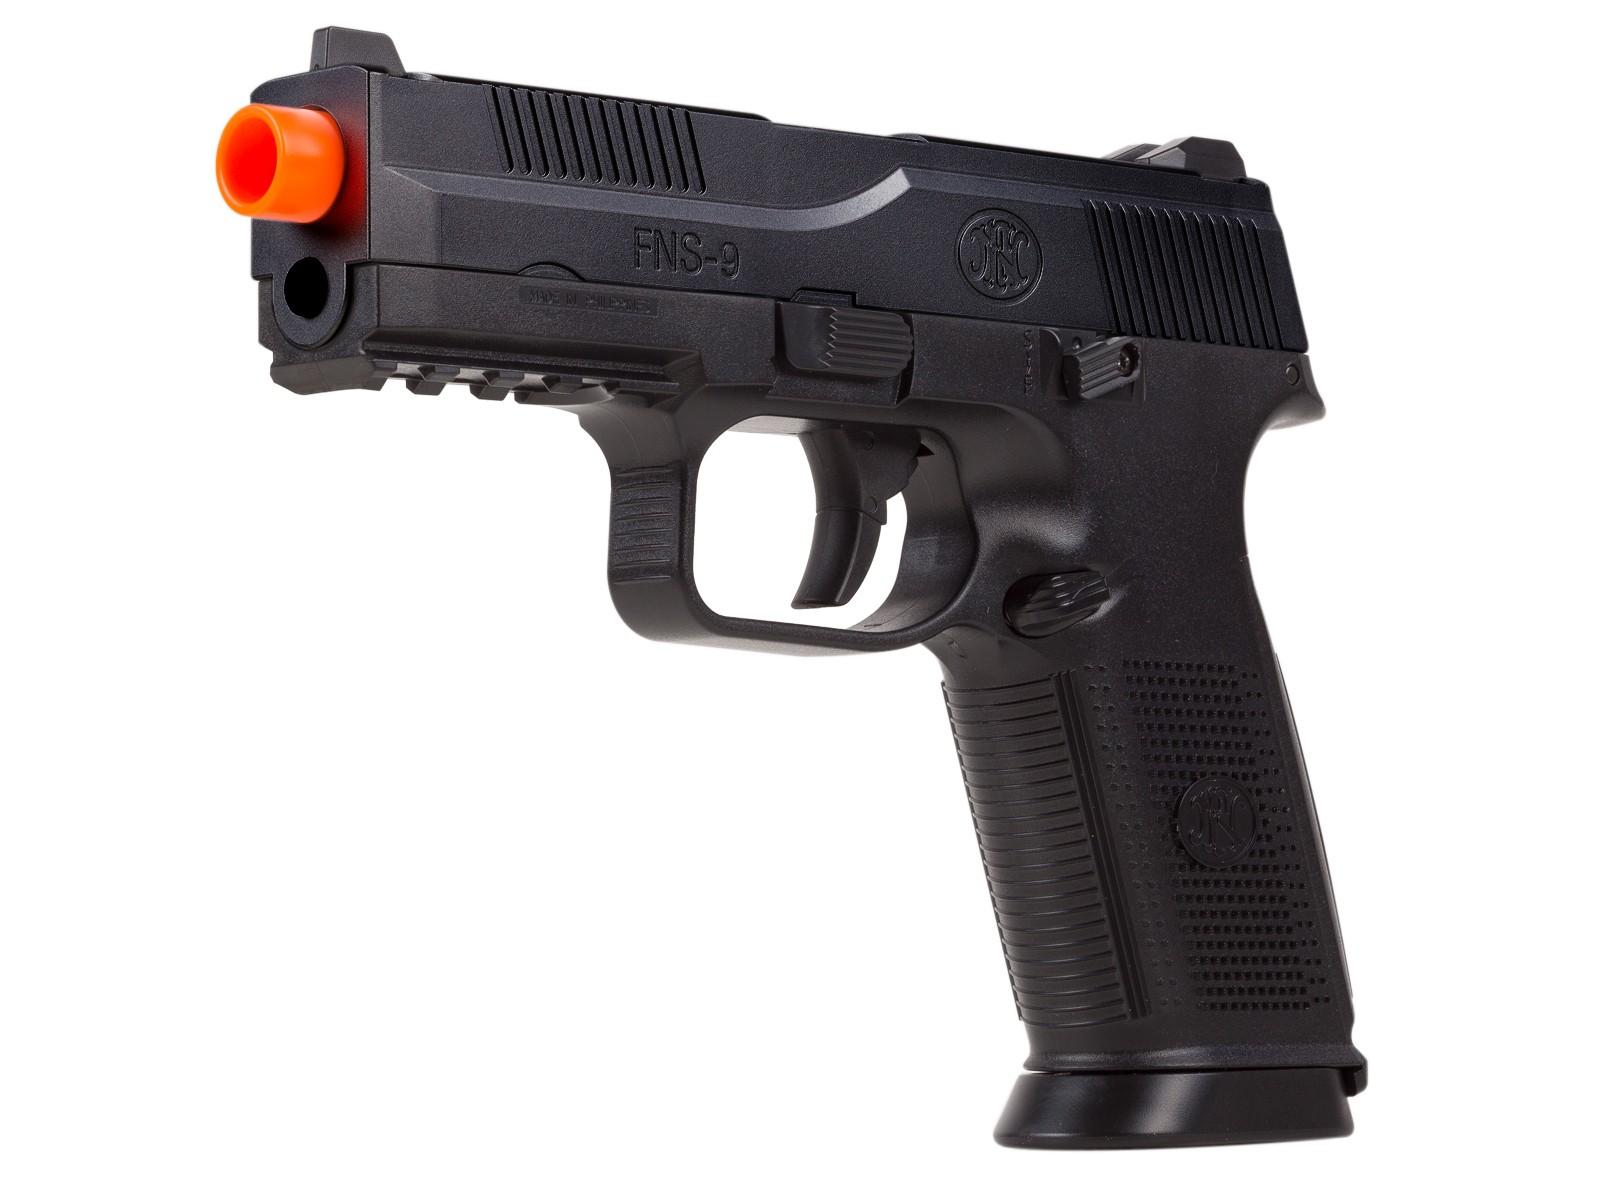 Pistolet Airsoft FN Herstal FNS-9 à ressort, noir 6 mm